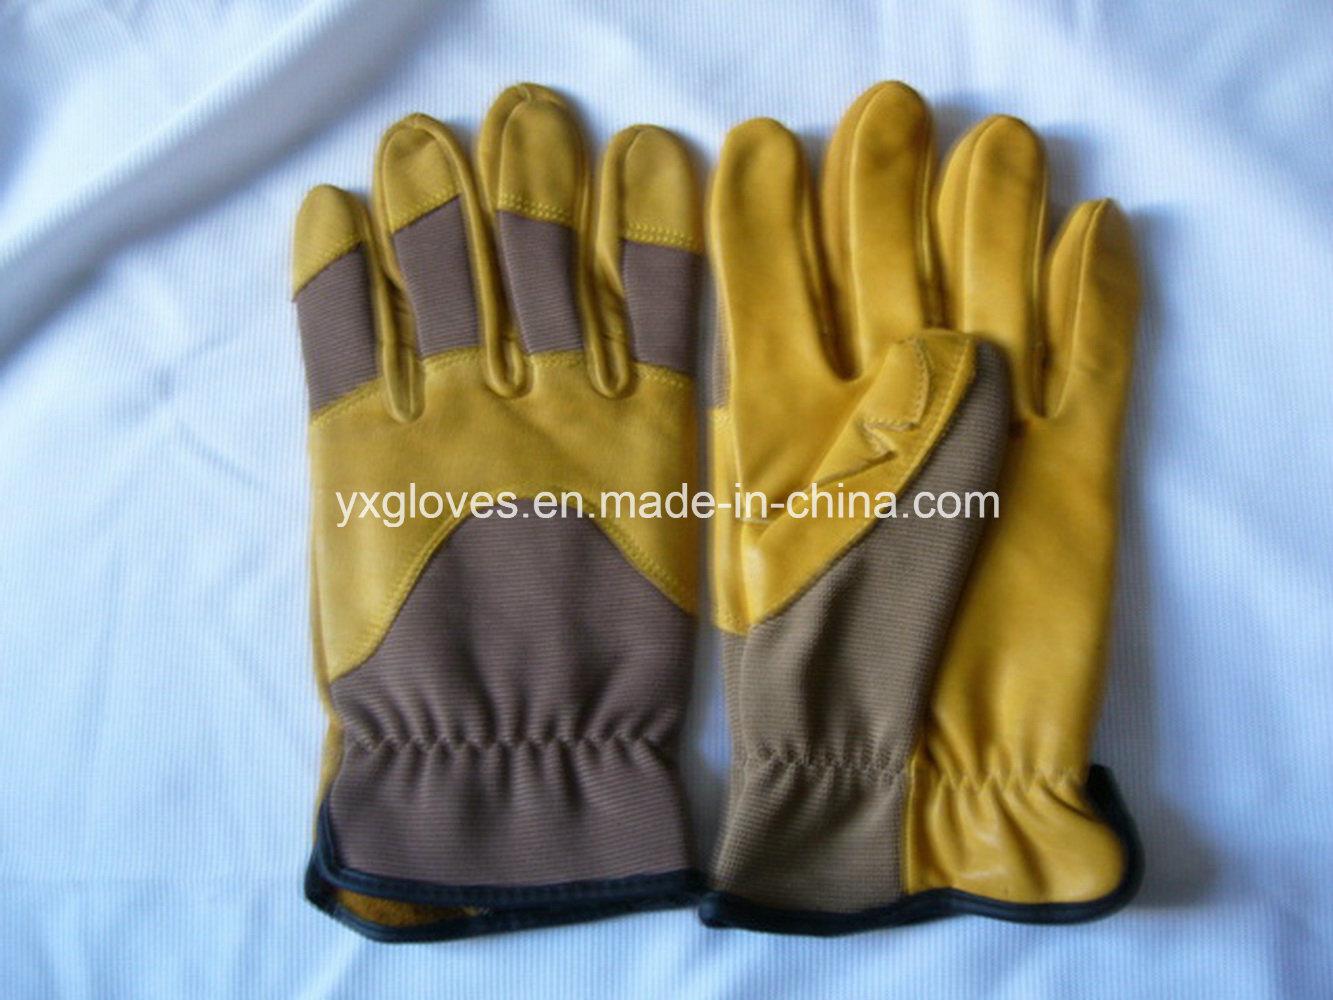 Mechanic Glove -Cow Leather Glove-Working Glove-Safety Glove-